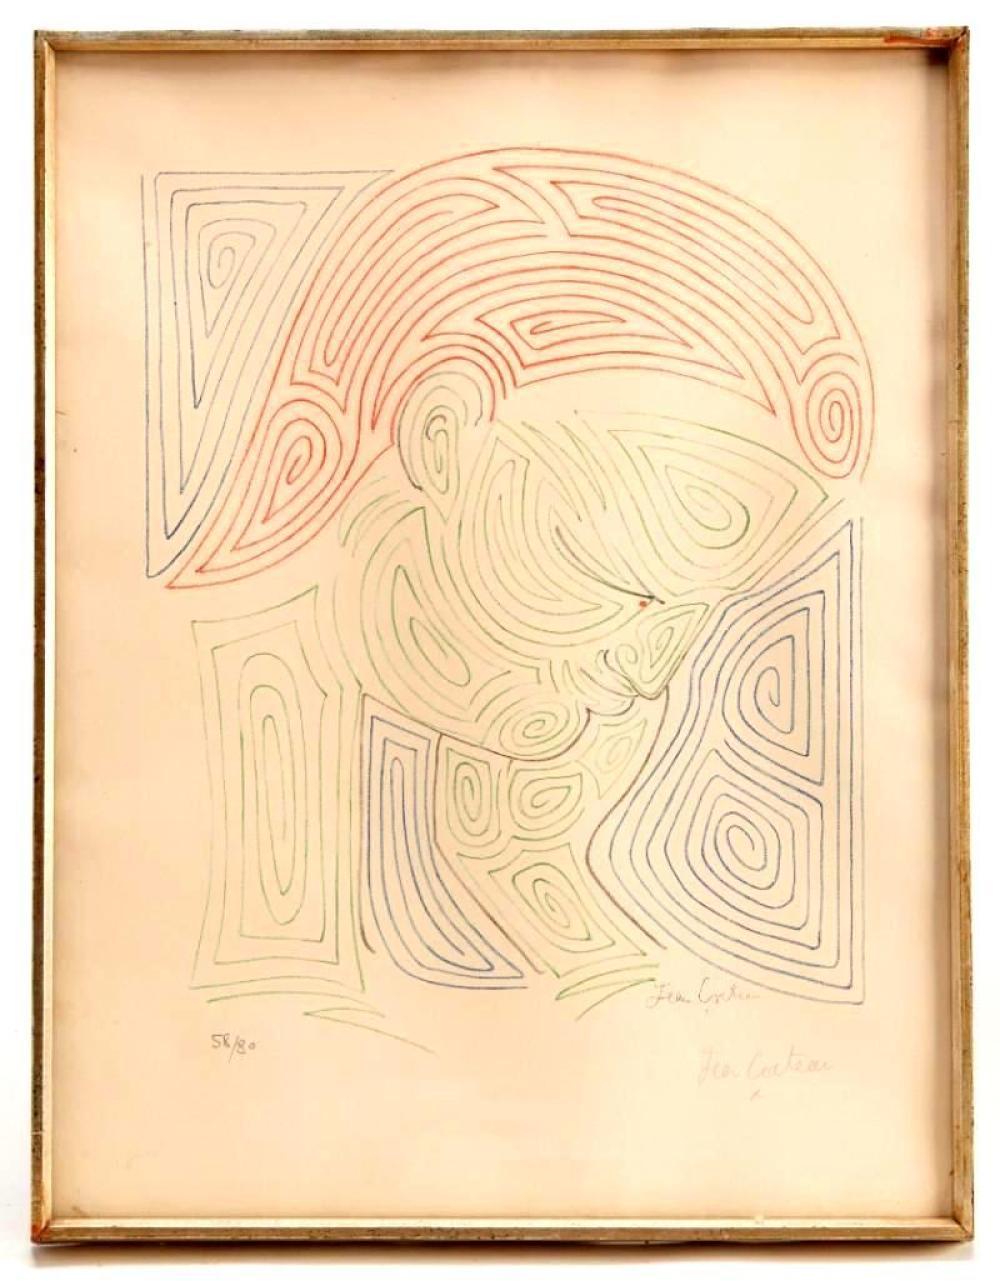 Jean Cocteau - Signed Print